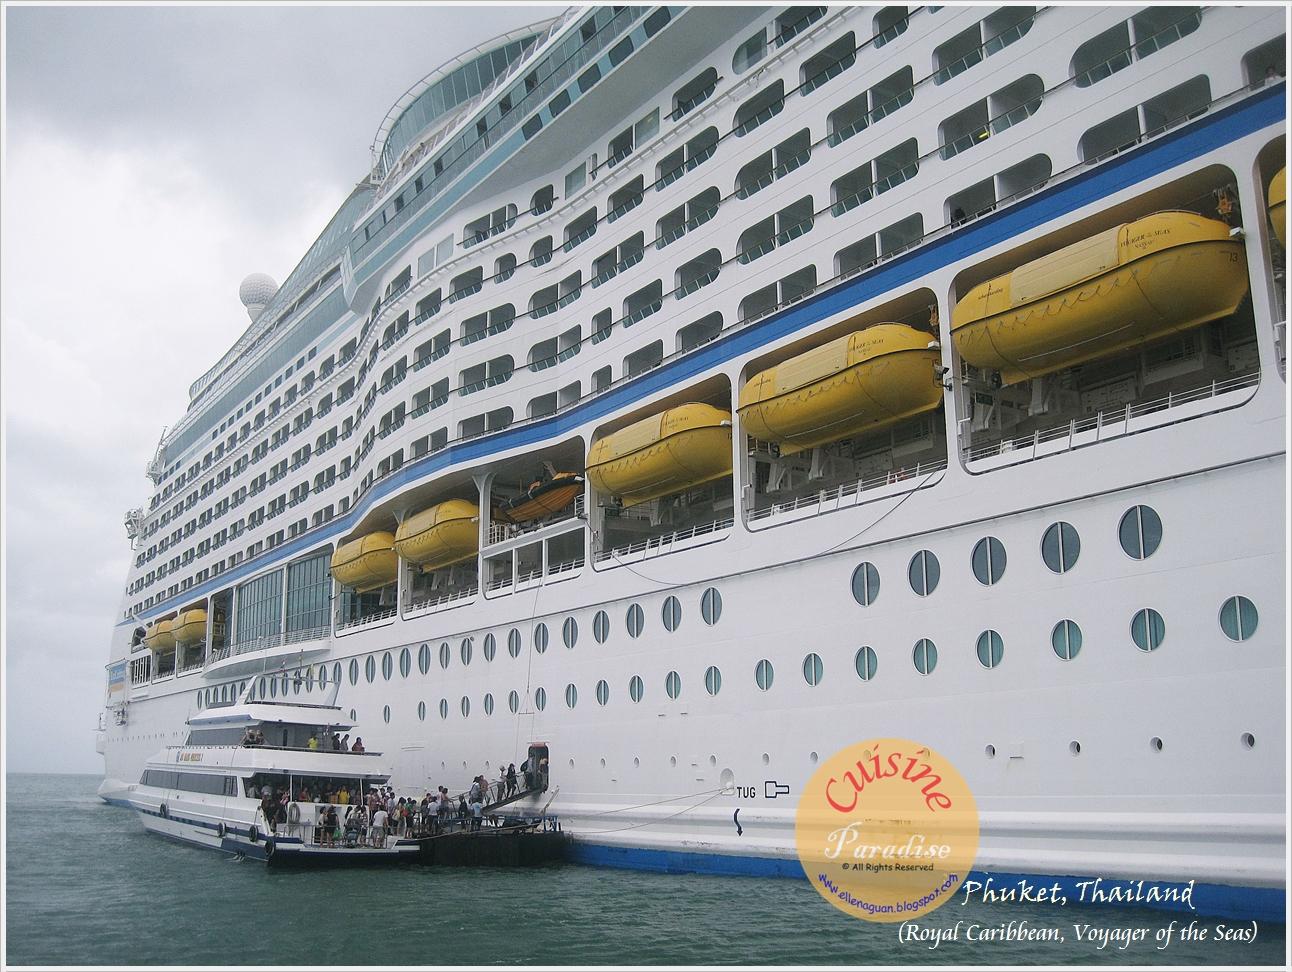 Royal Caribbean Cruise From Singapore To Phuket Body  Punchaoscom